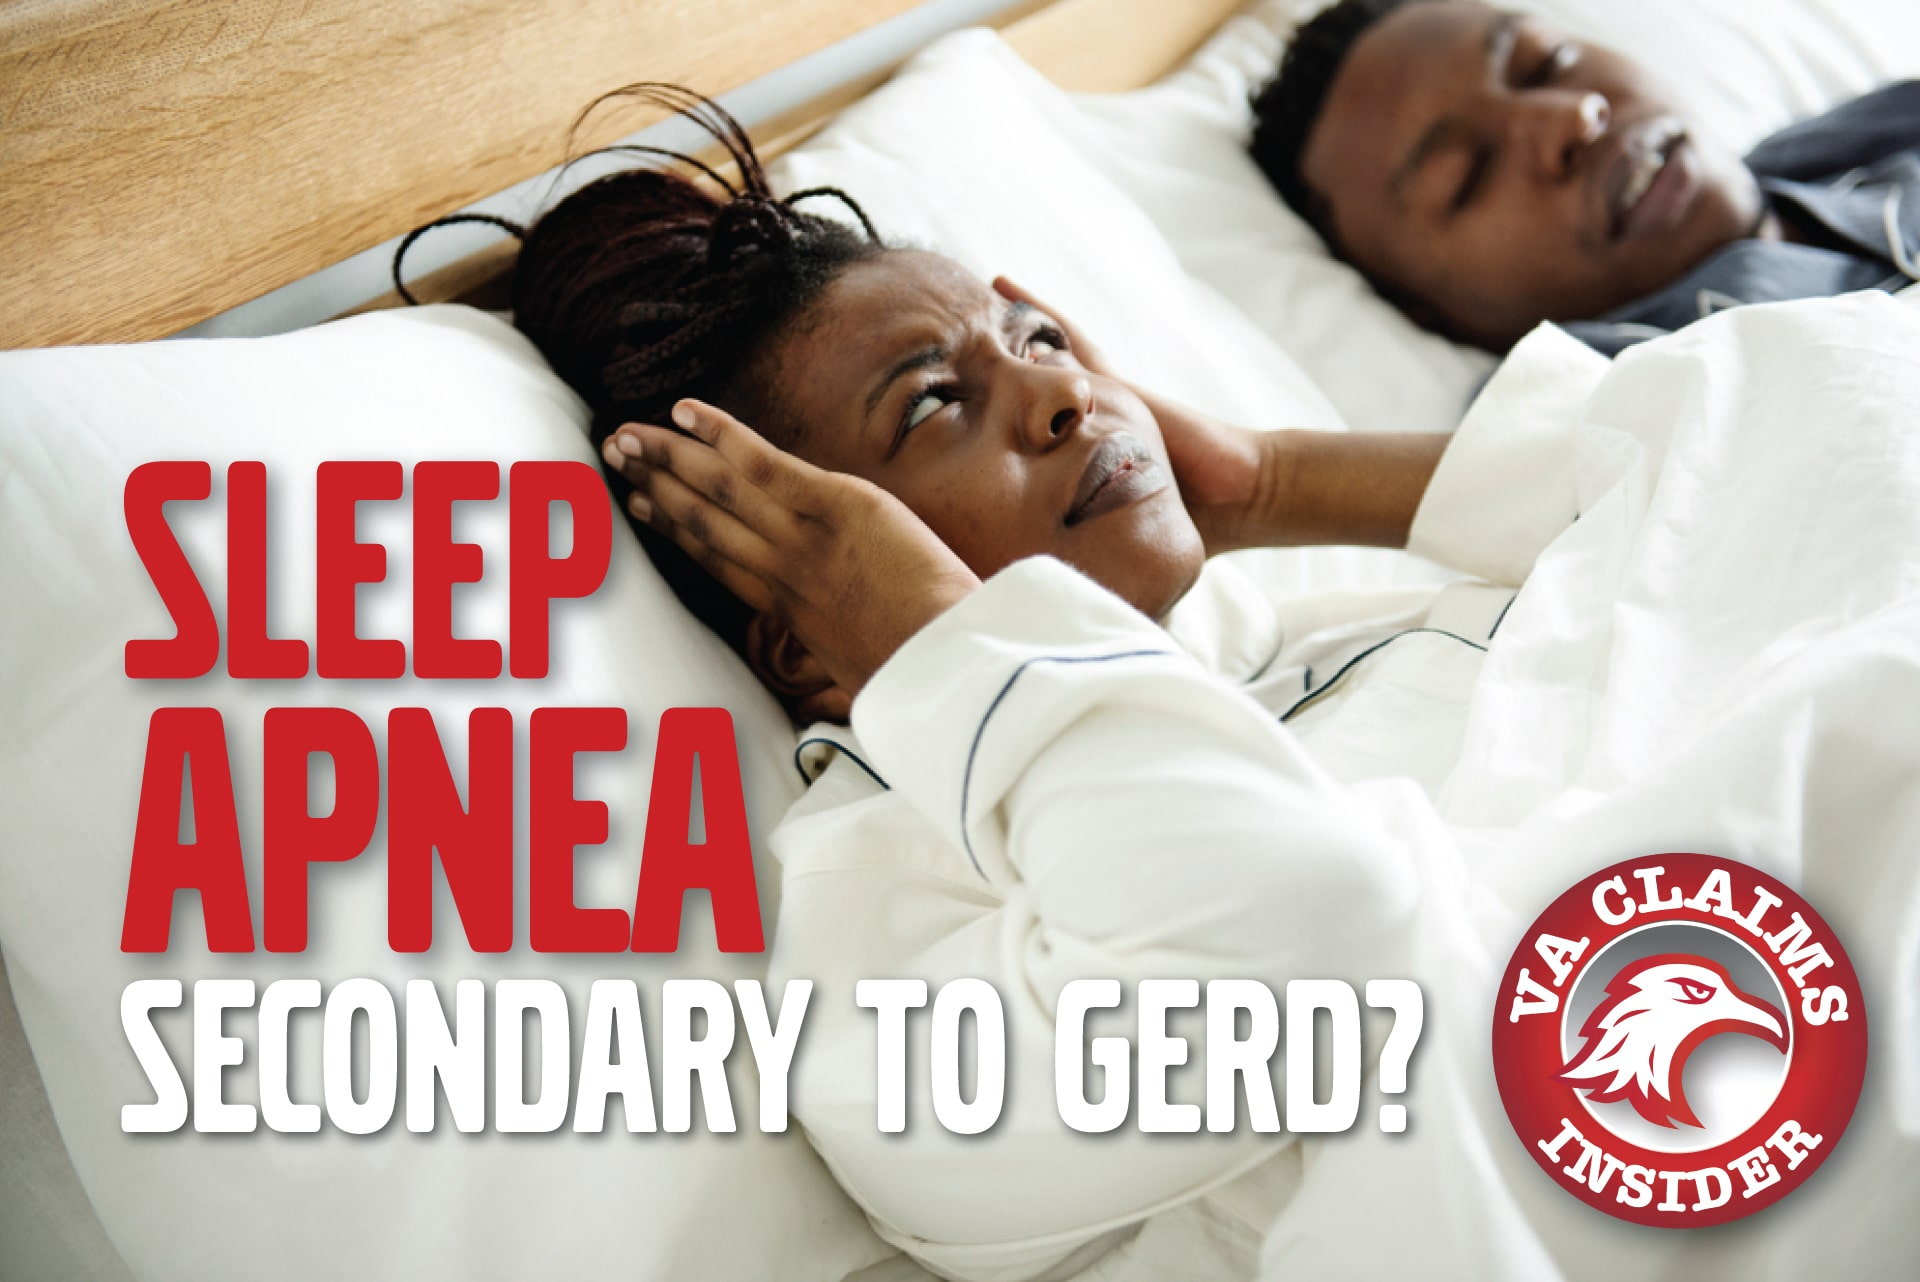 Sleep Apnea Secondary to GERD – The Experts Guide Blog Sleep Apnea Secondary to Gerd min